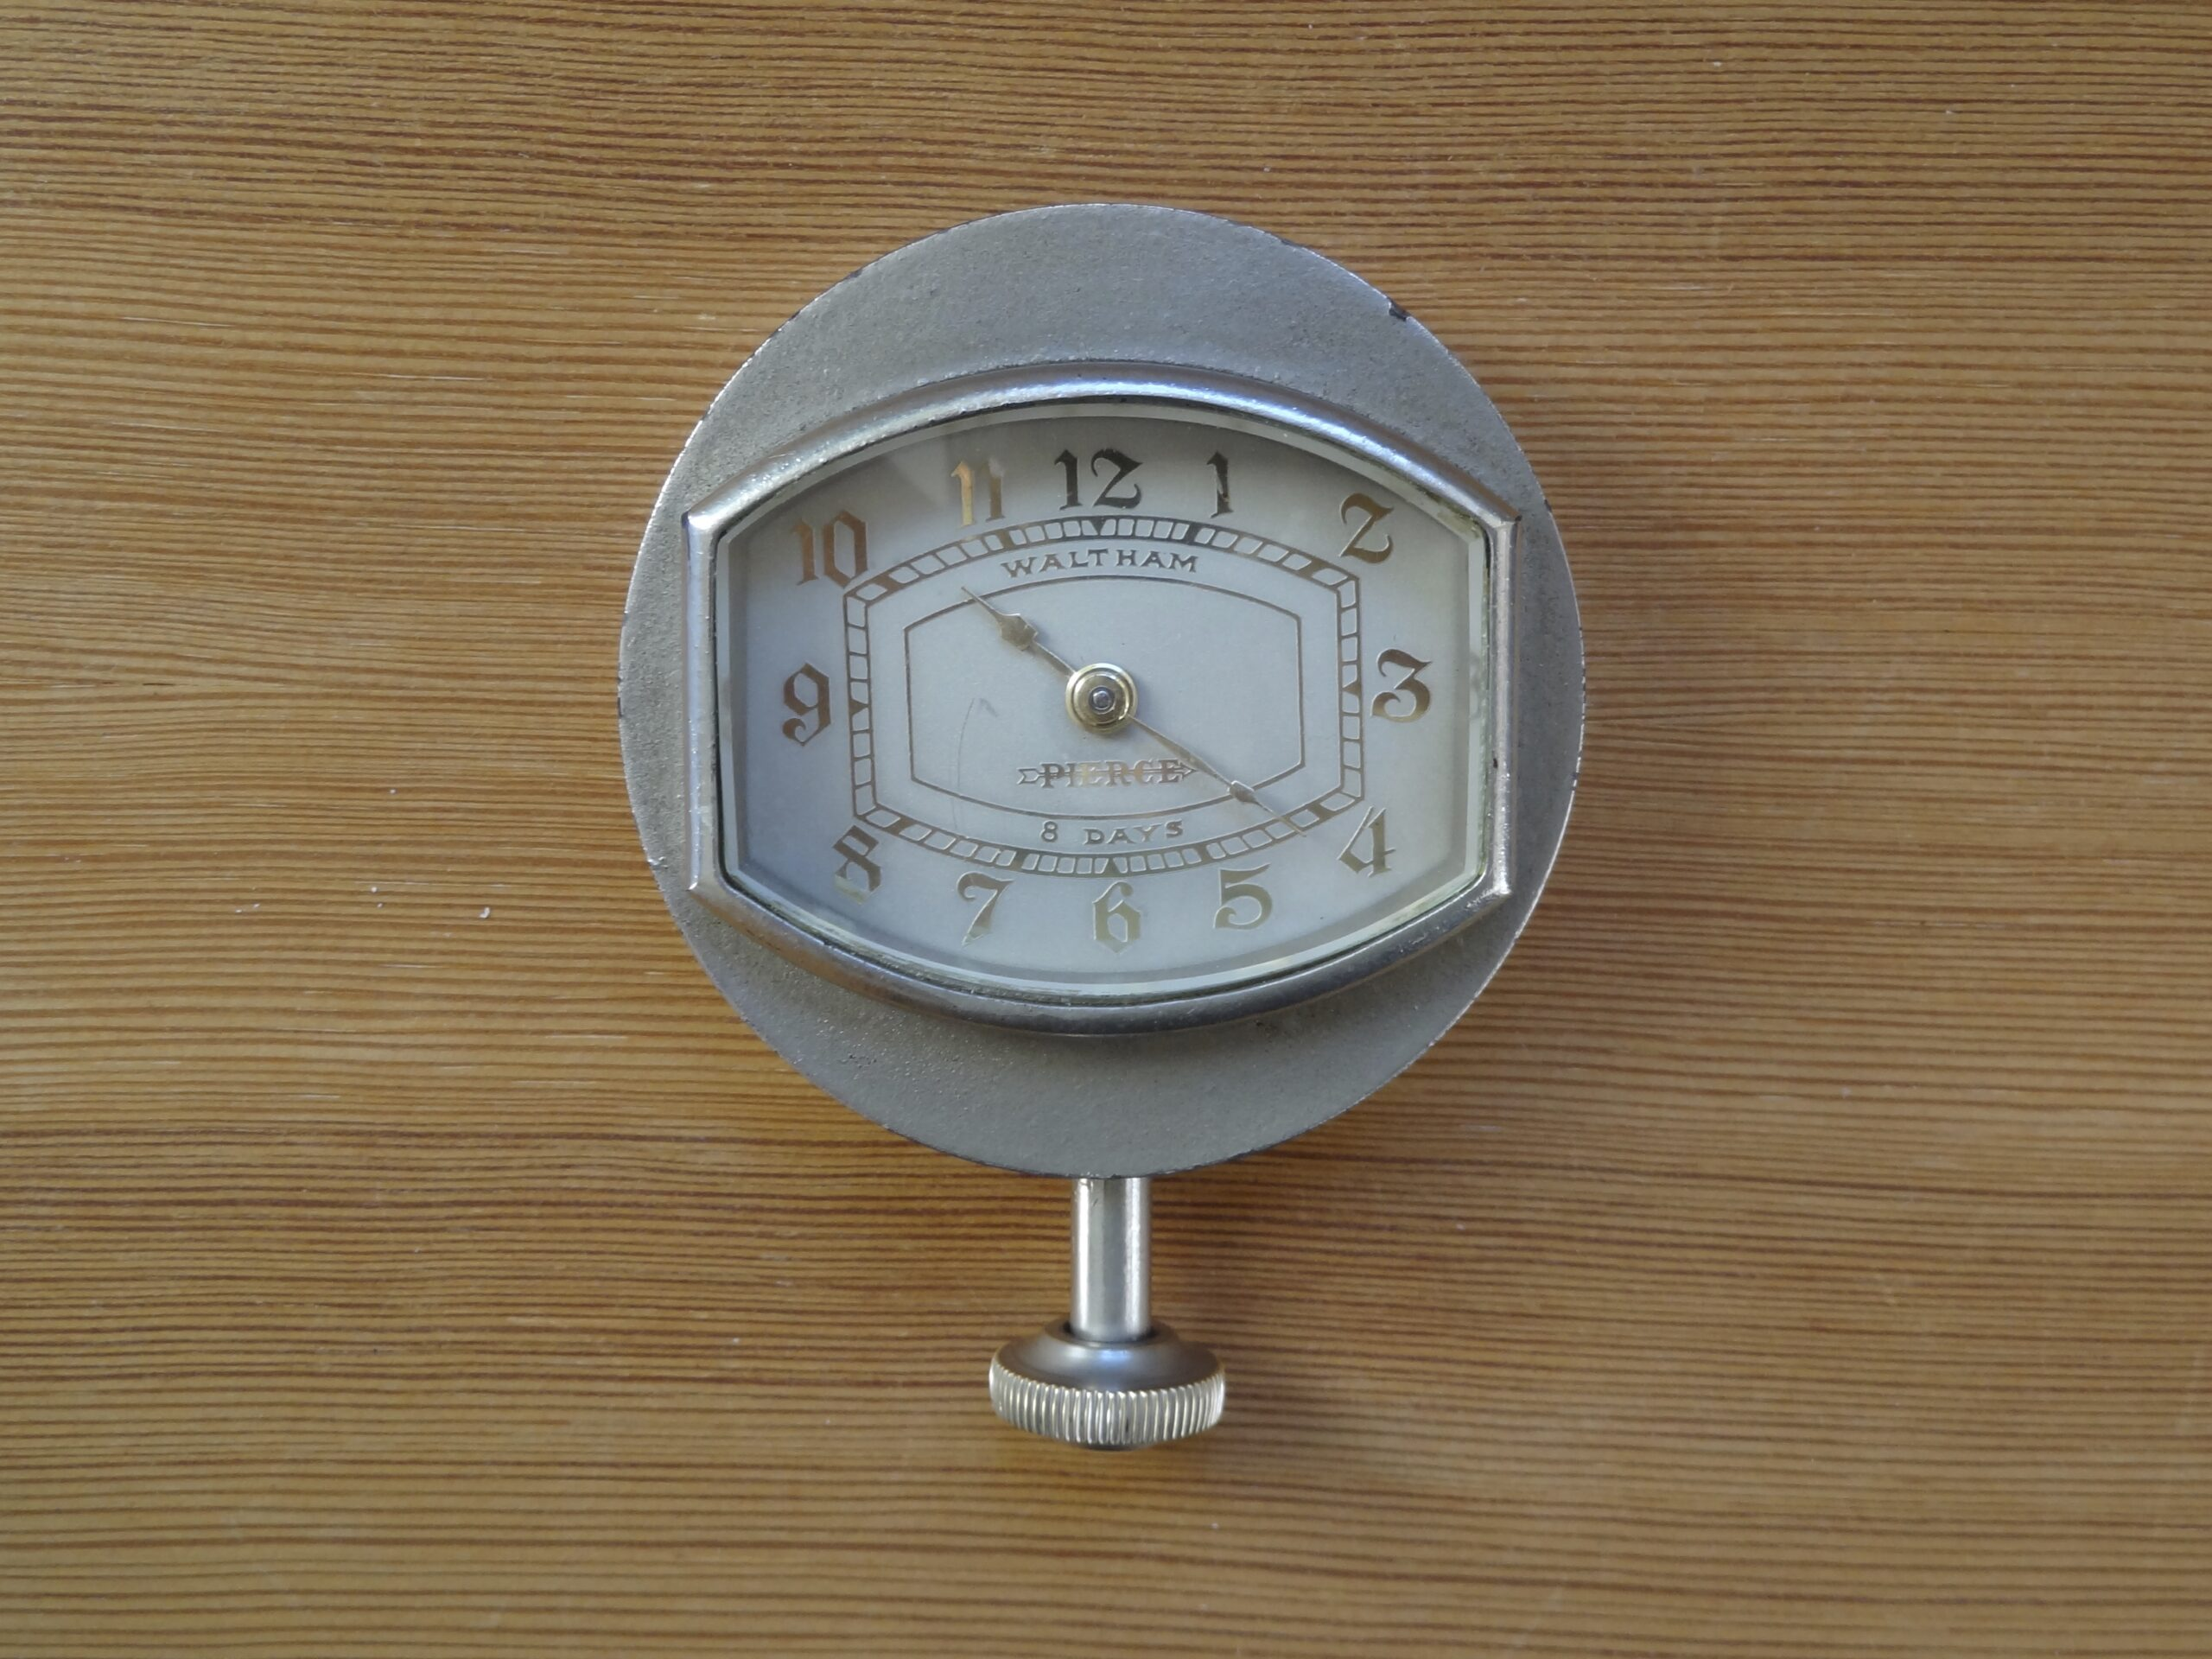 Pierce arrow car clock from Waltham ca 1920